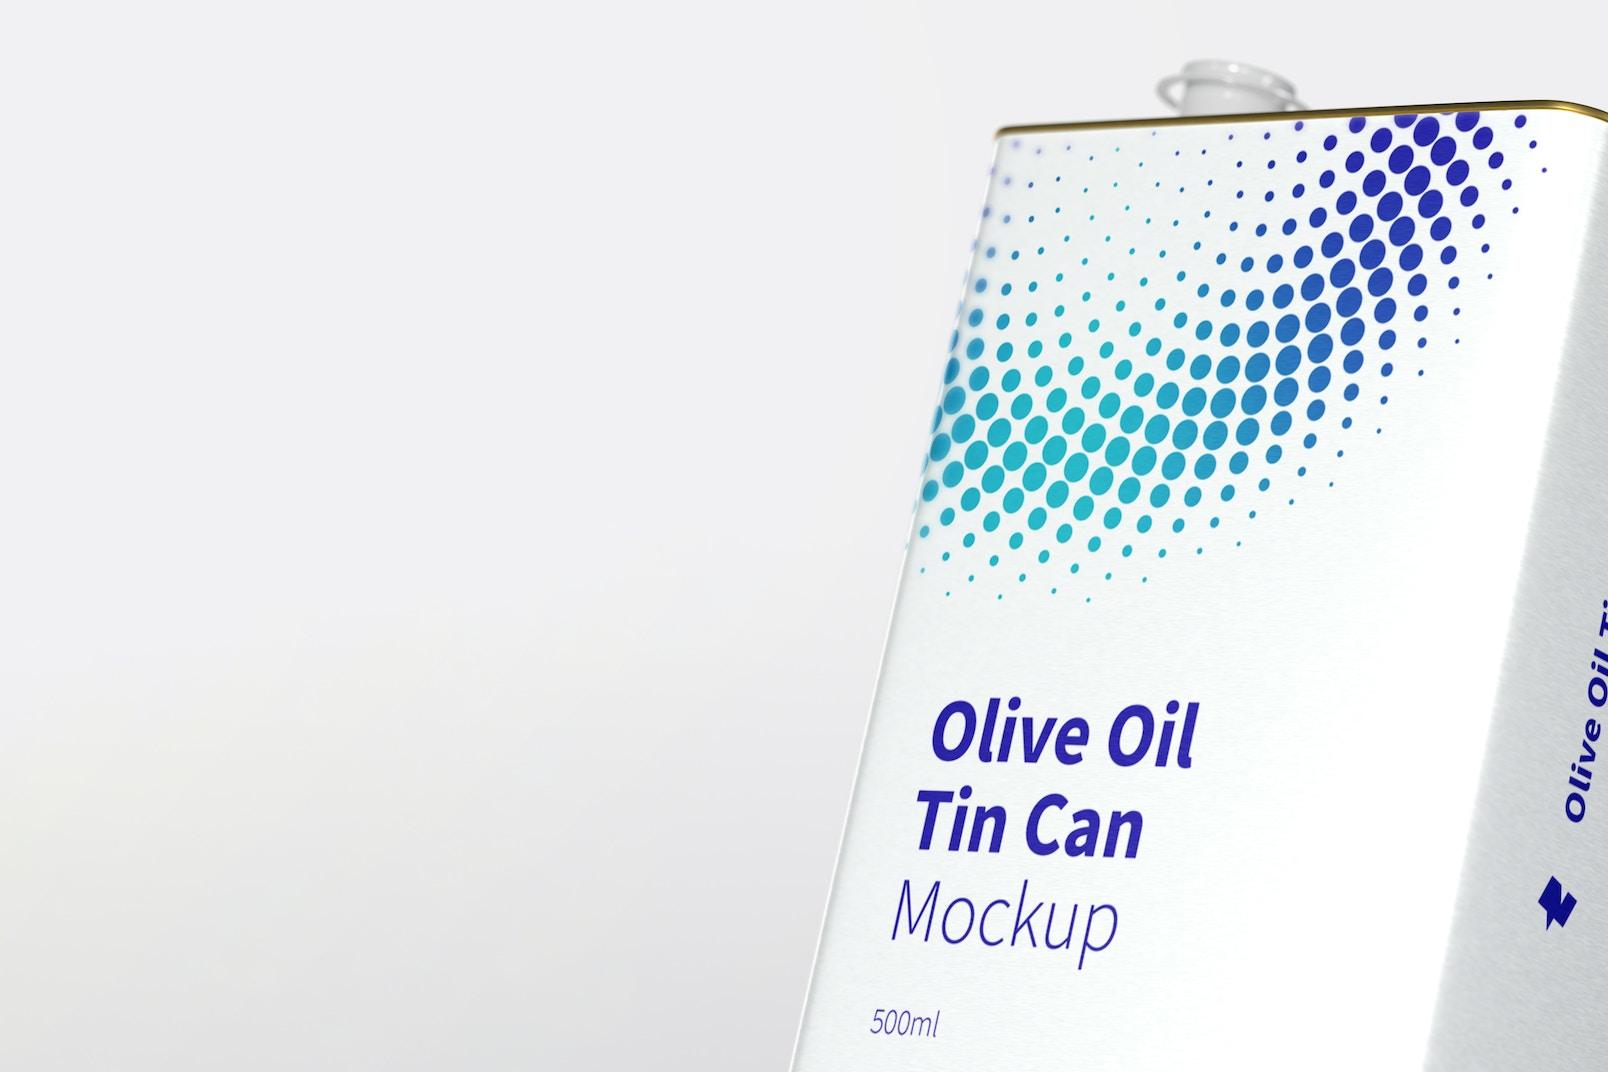 500ml Olive Oil Rectangular Tin Can Mockup, Close-Up